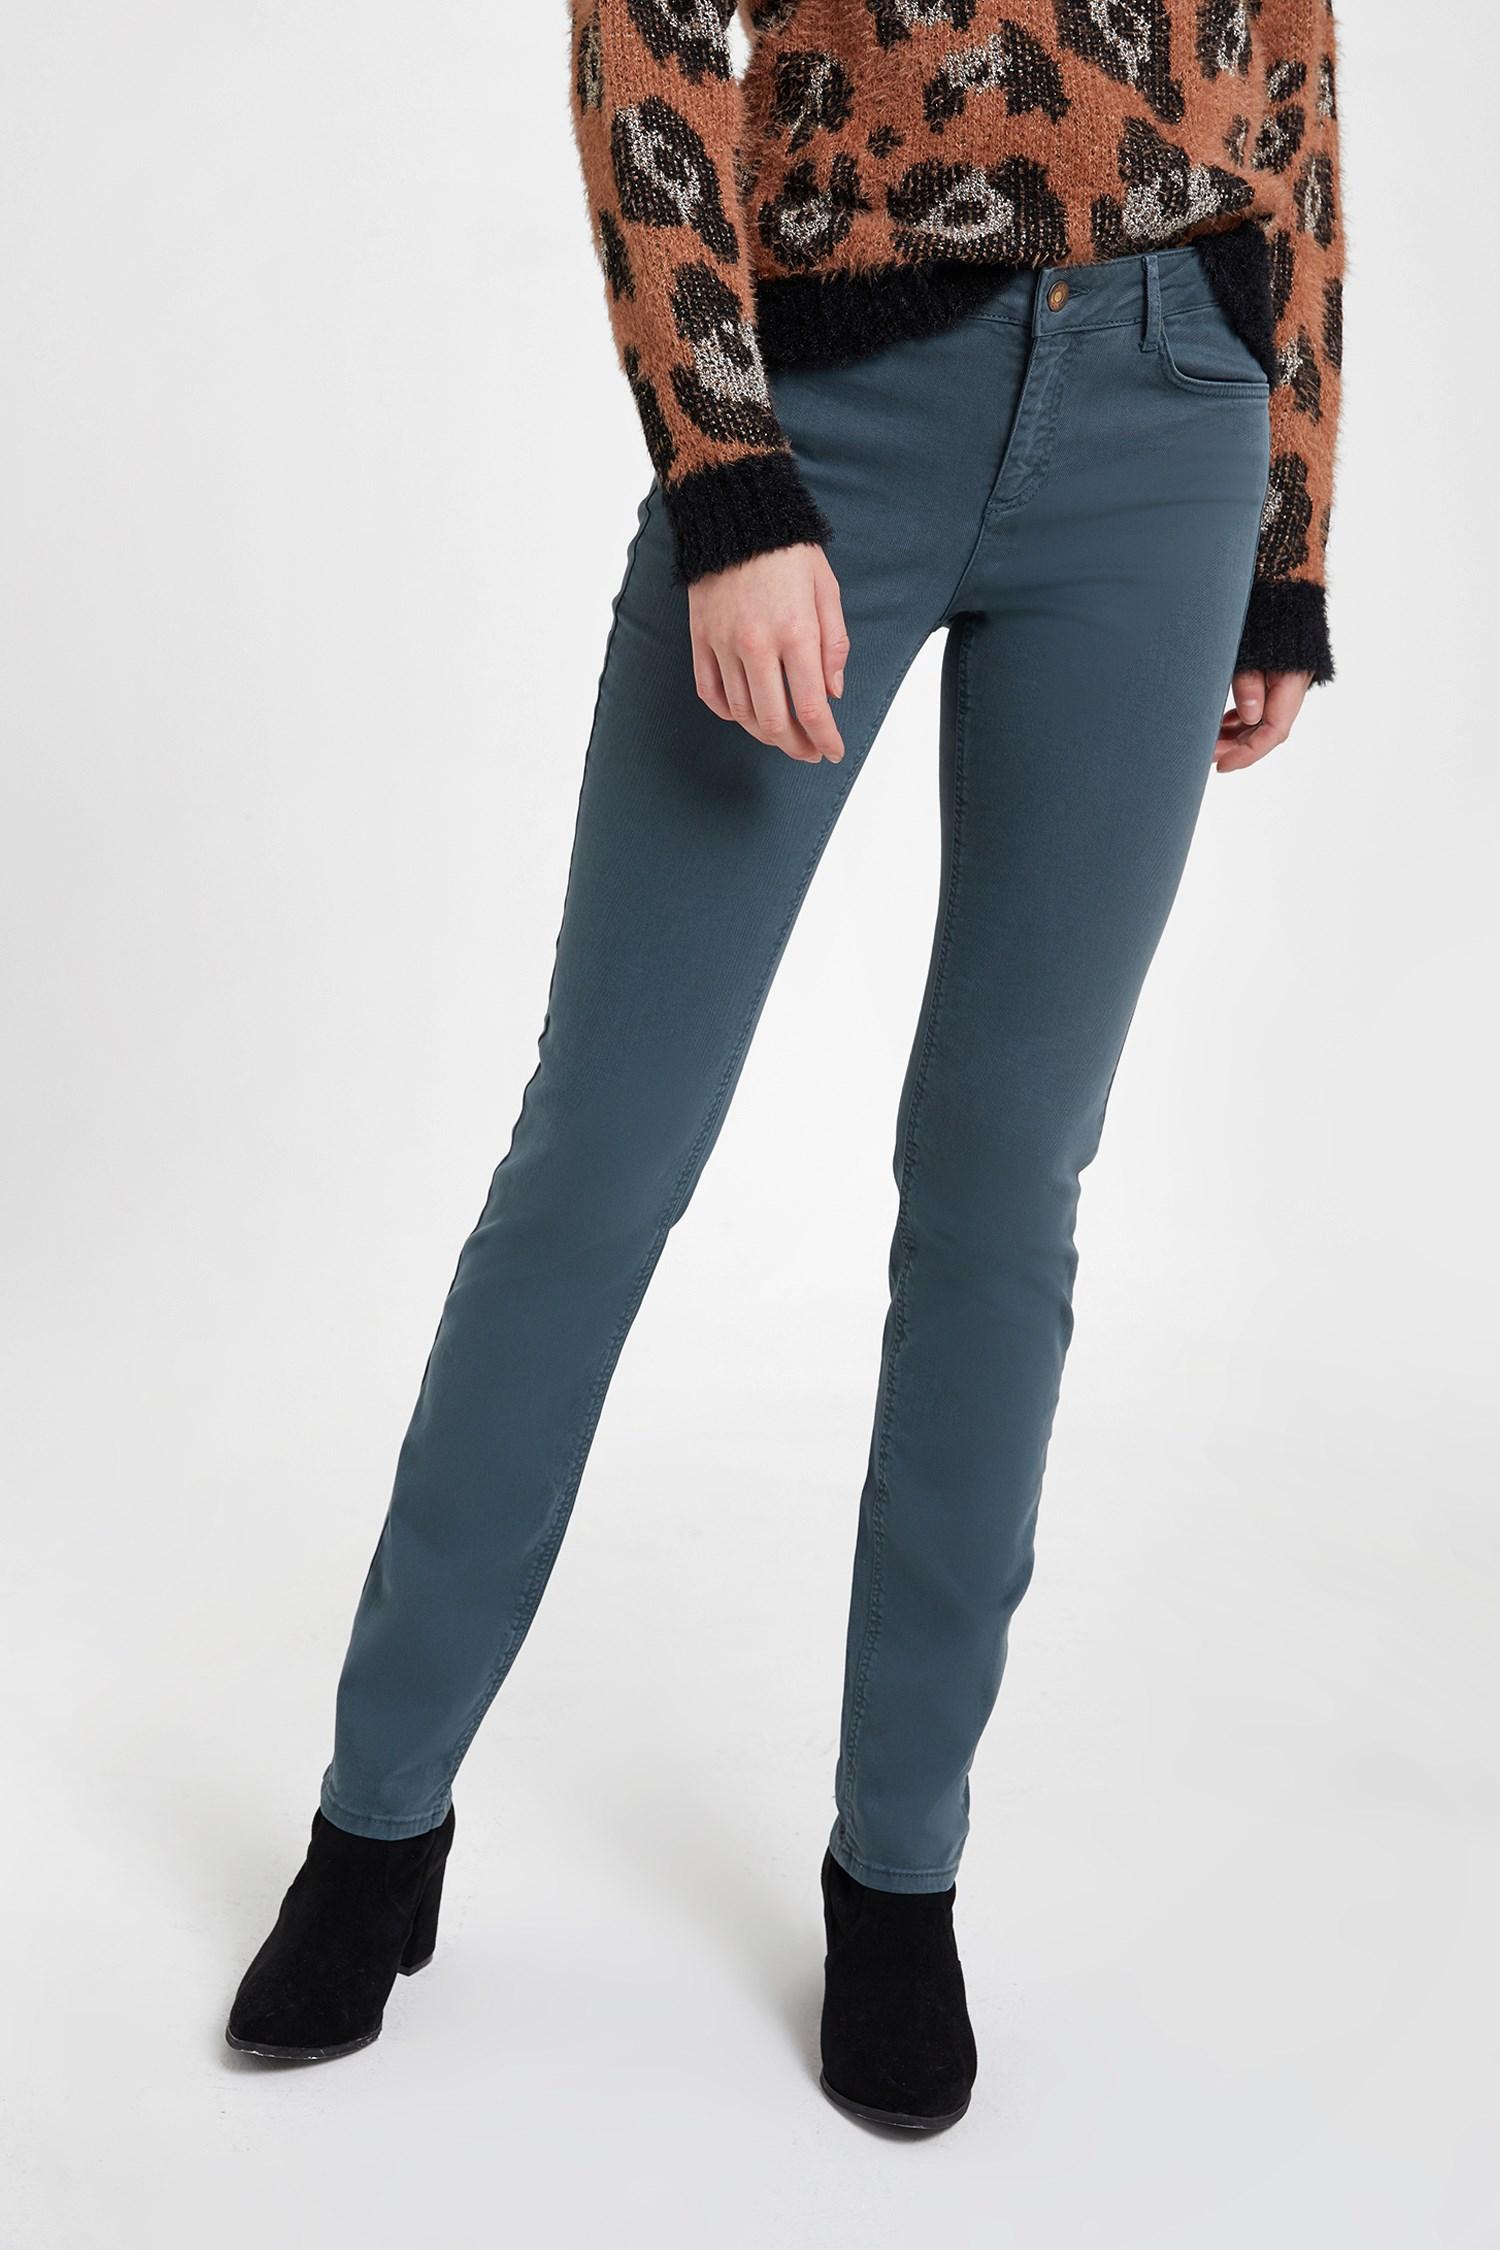 Bayan Gri Boru Paça Esnek Pantolon